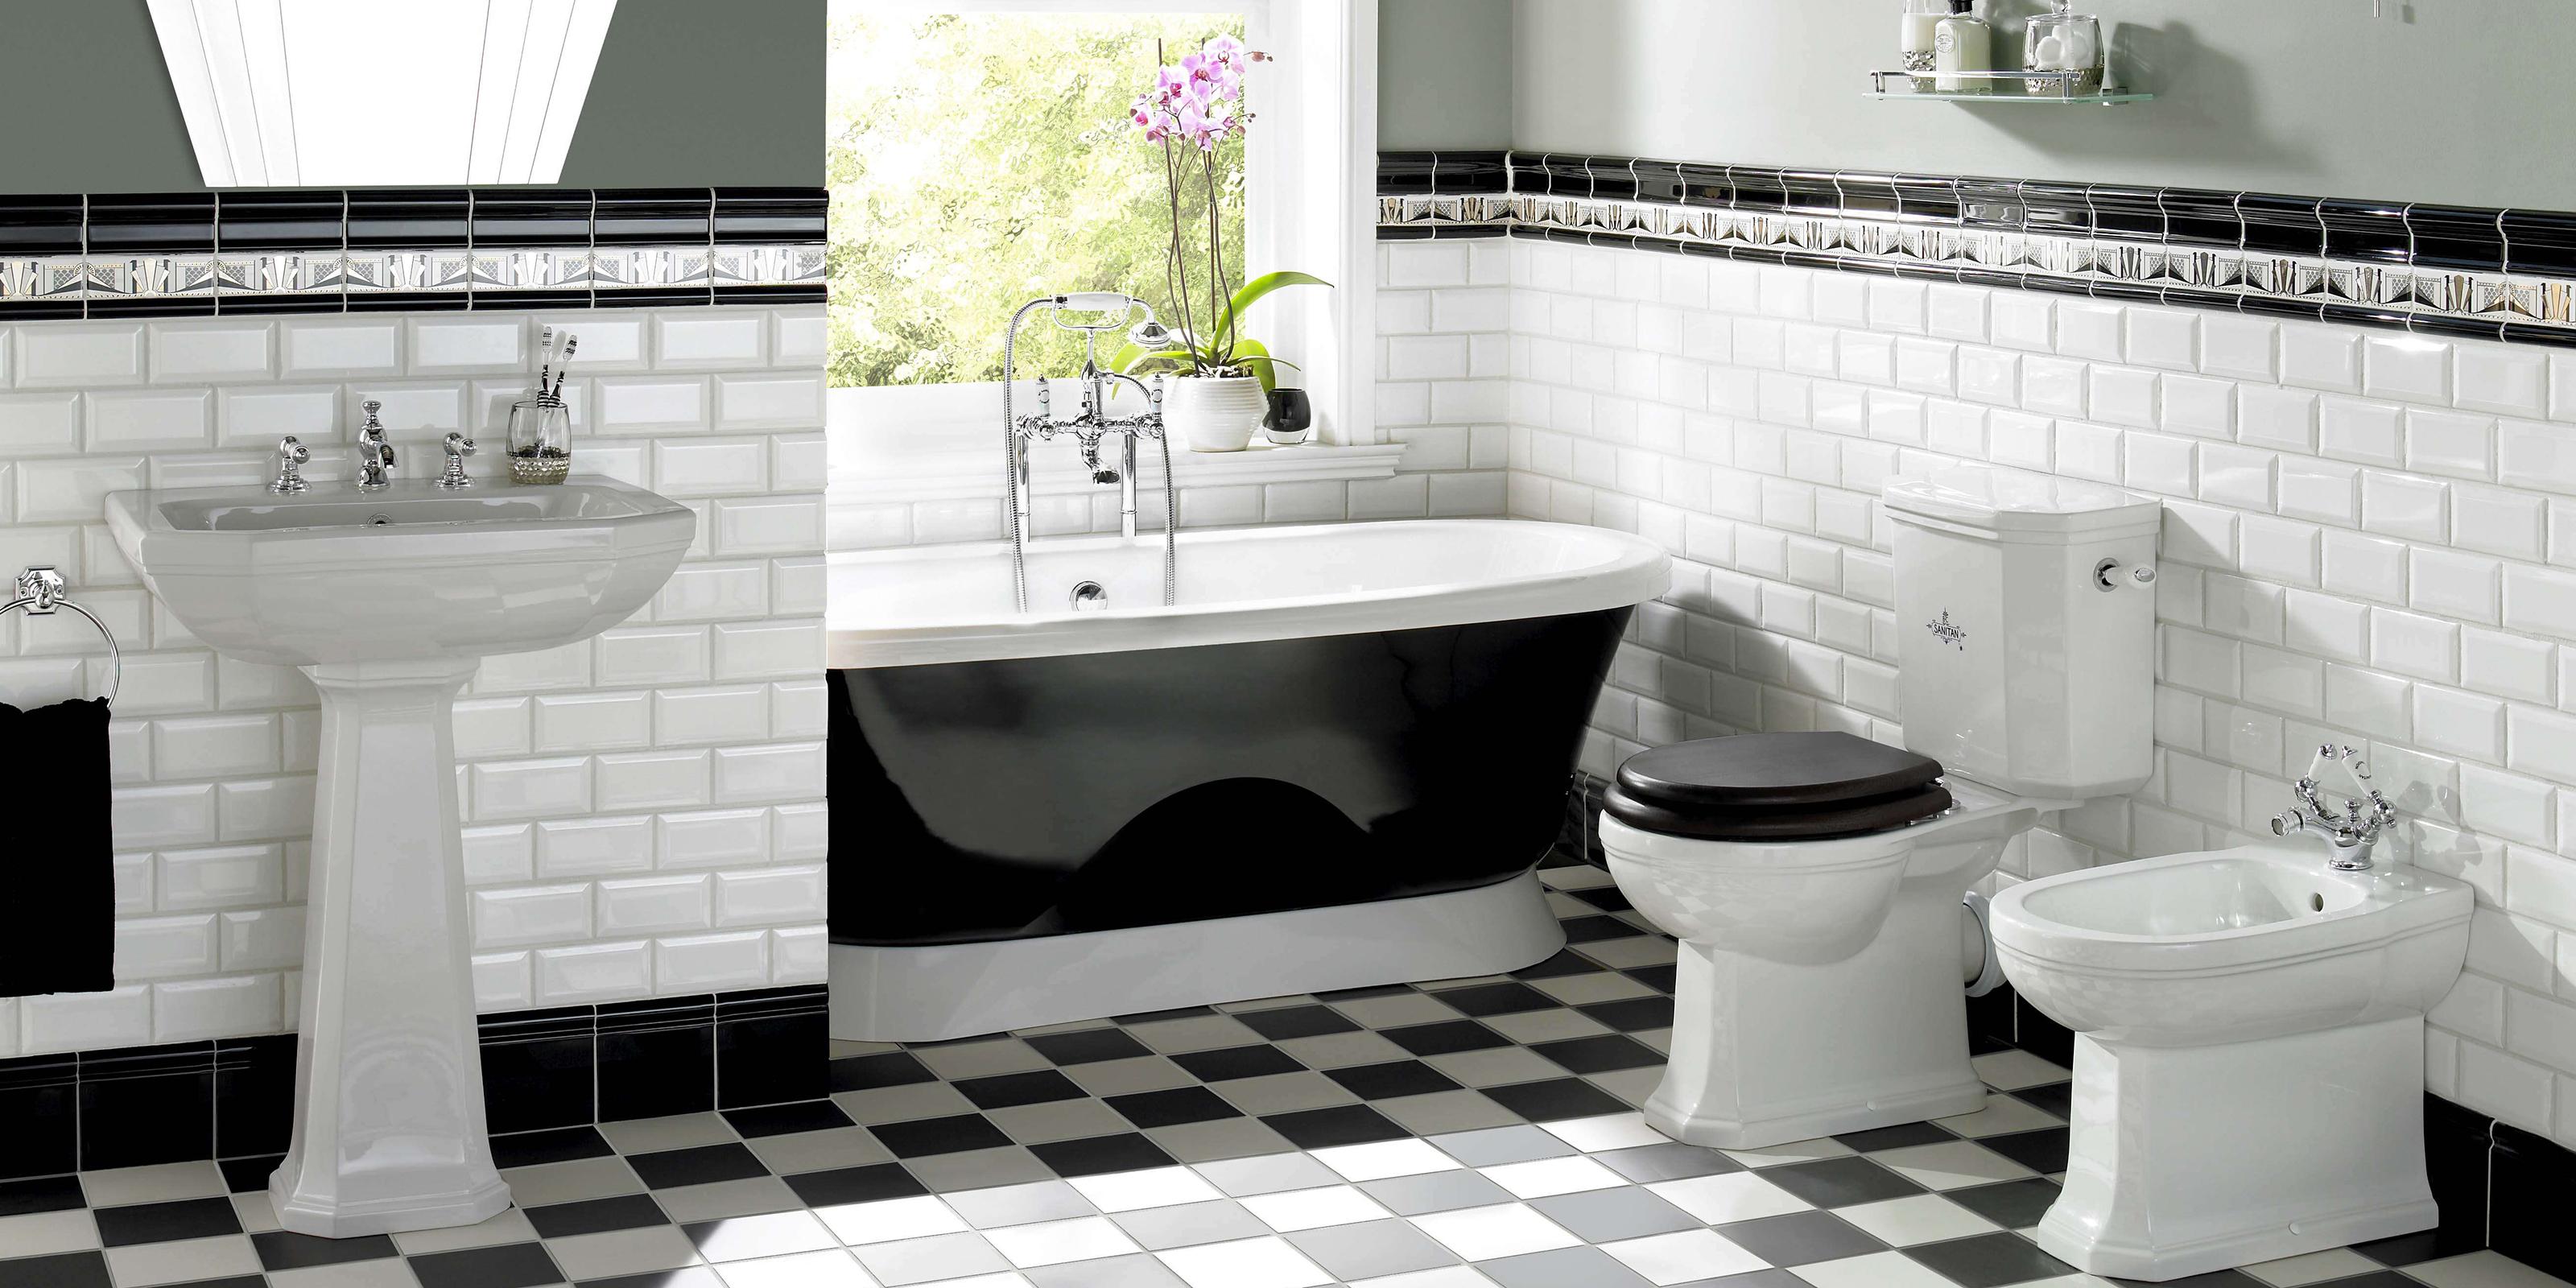 Black Bathroom Ideas 18 Monochrome Looks To Inspire Real Homes